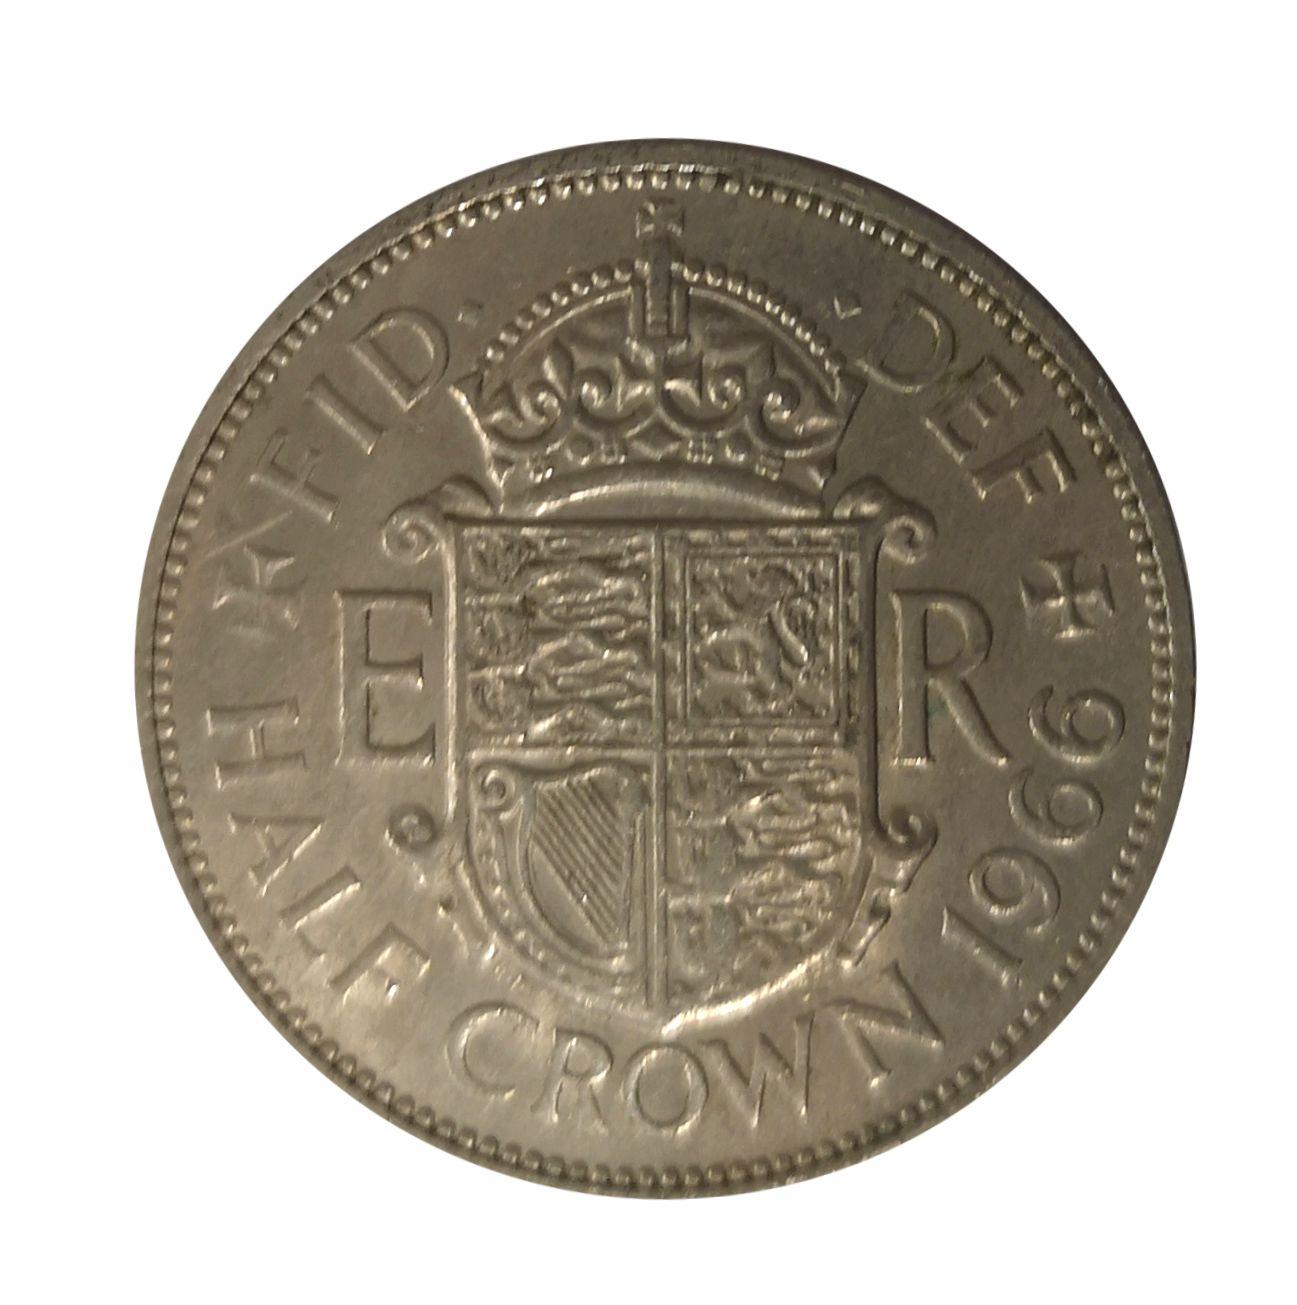 half crown coin 1950